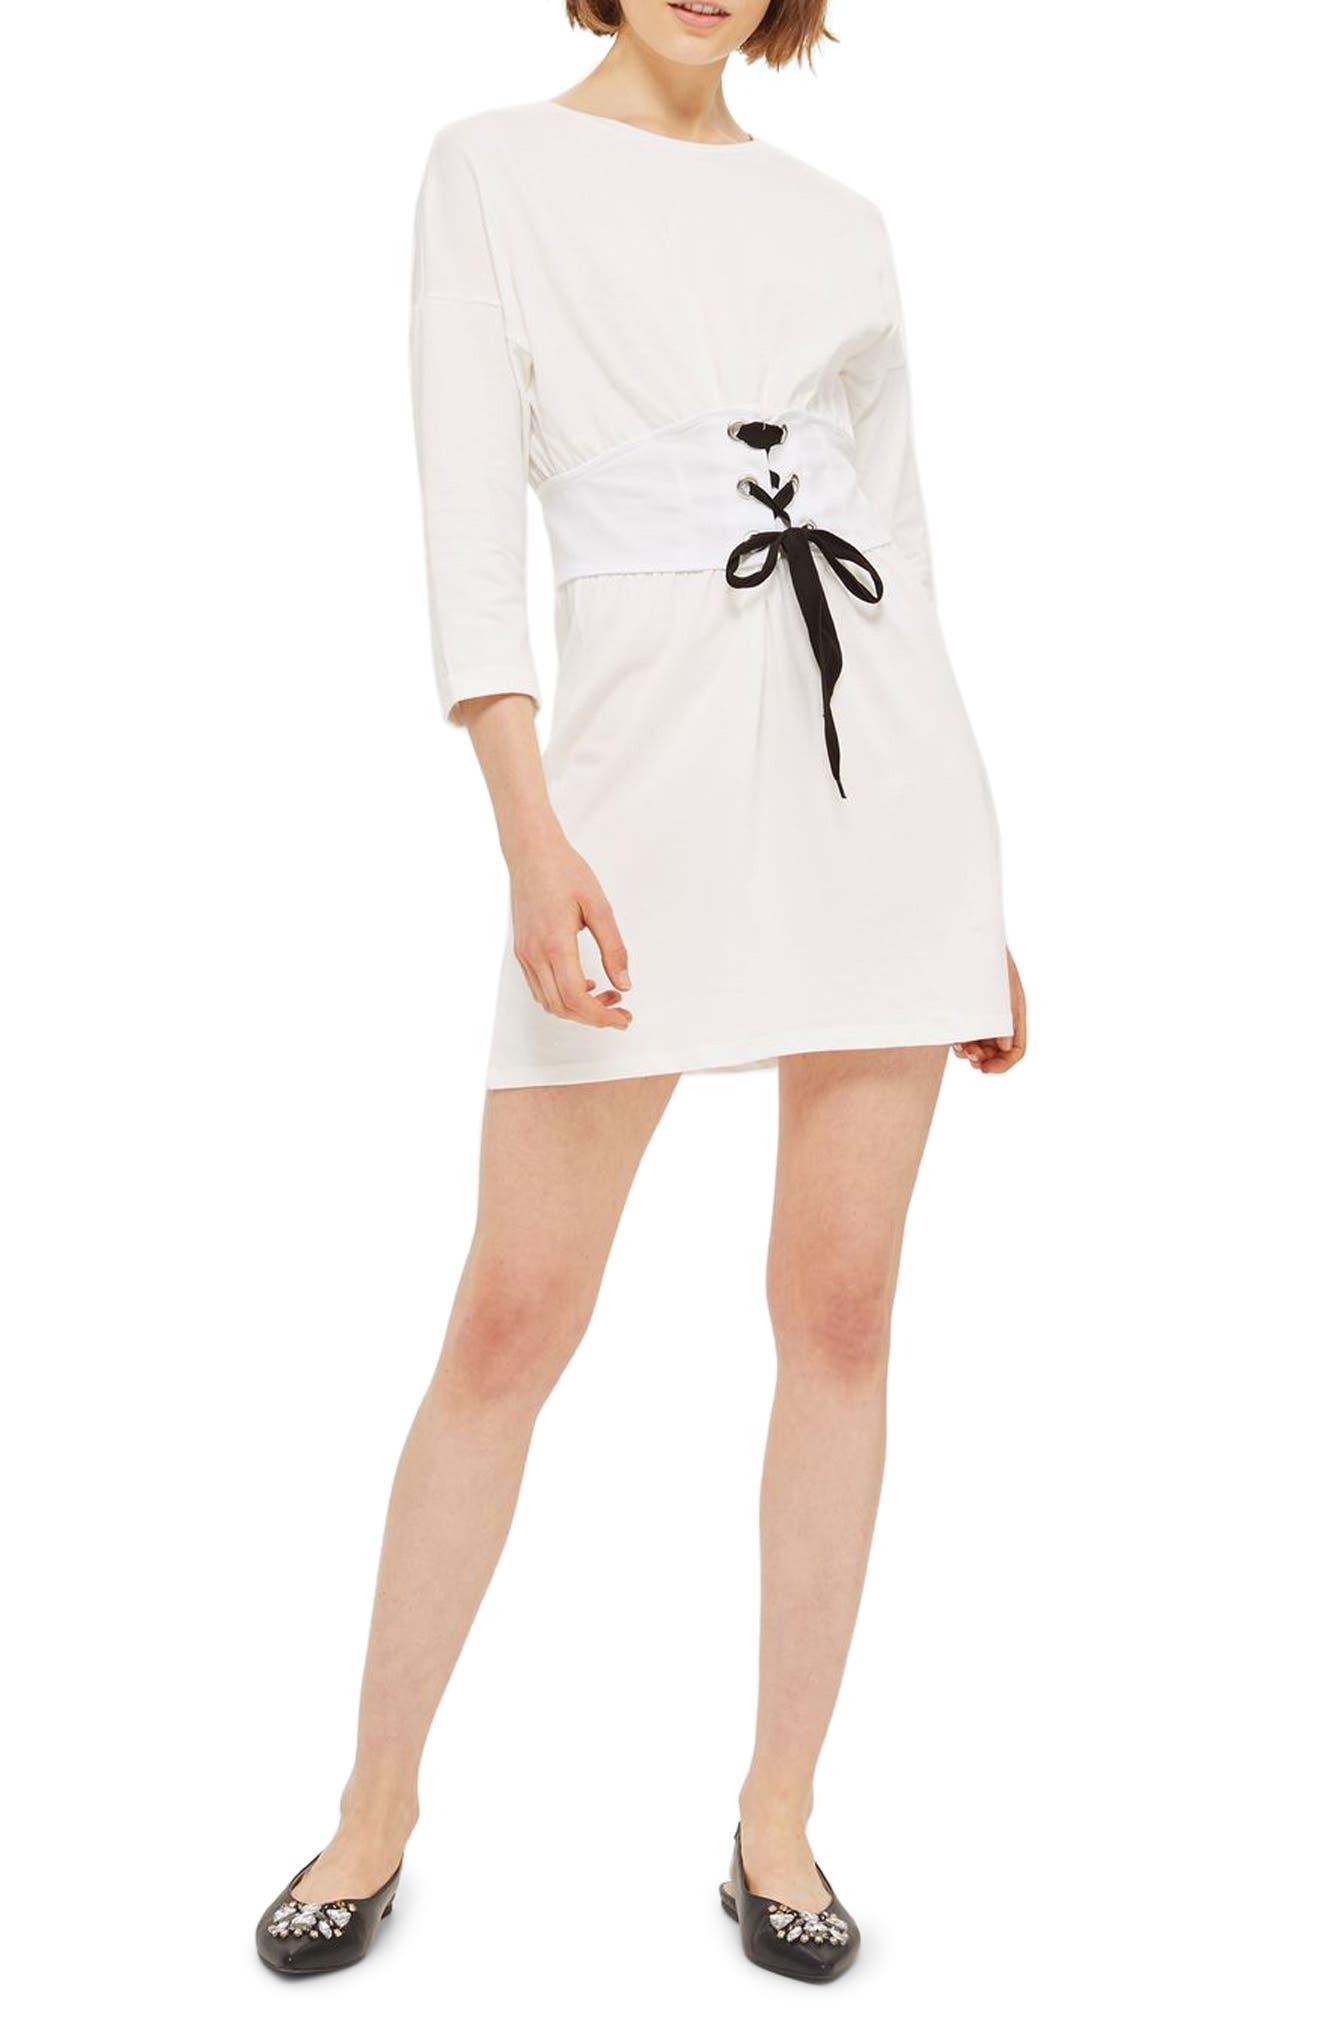 Alternate Image 1 Selected - Topshop Corset T-Shirt Dress